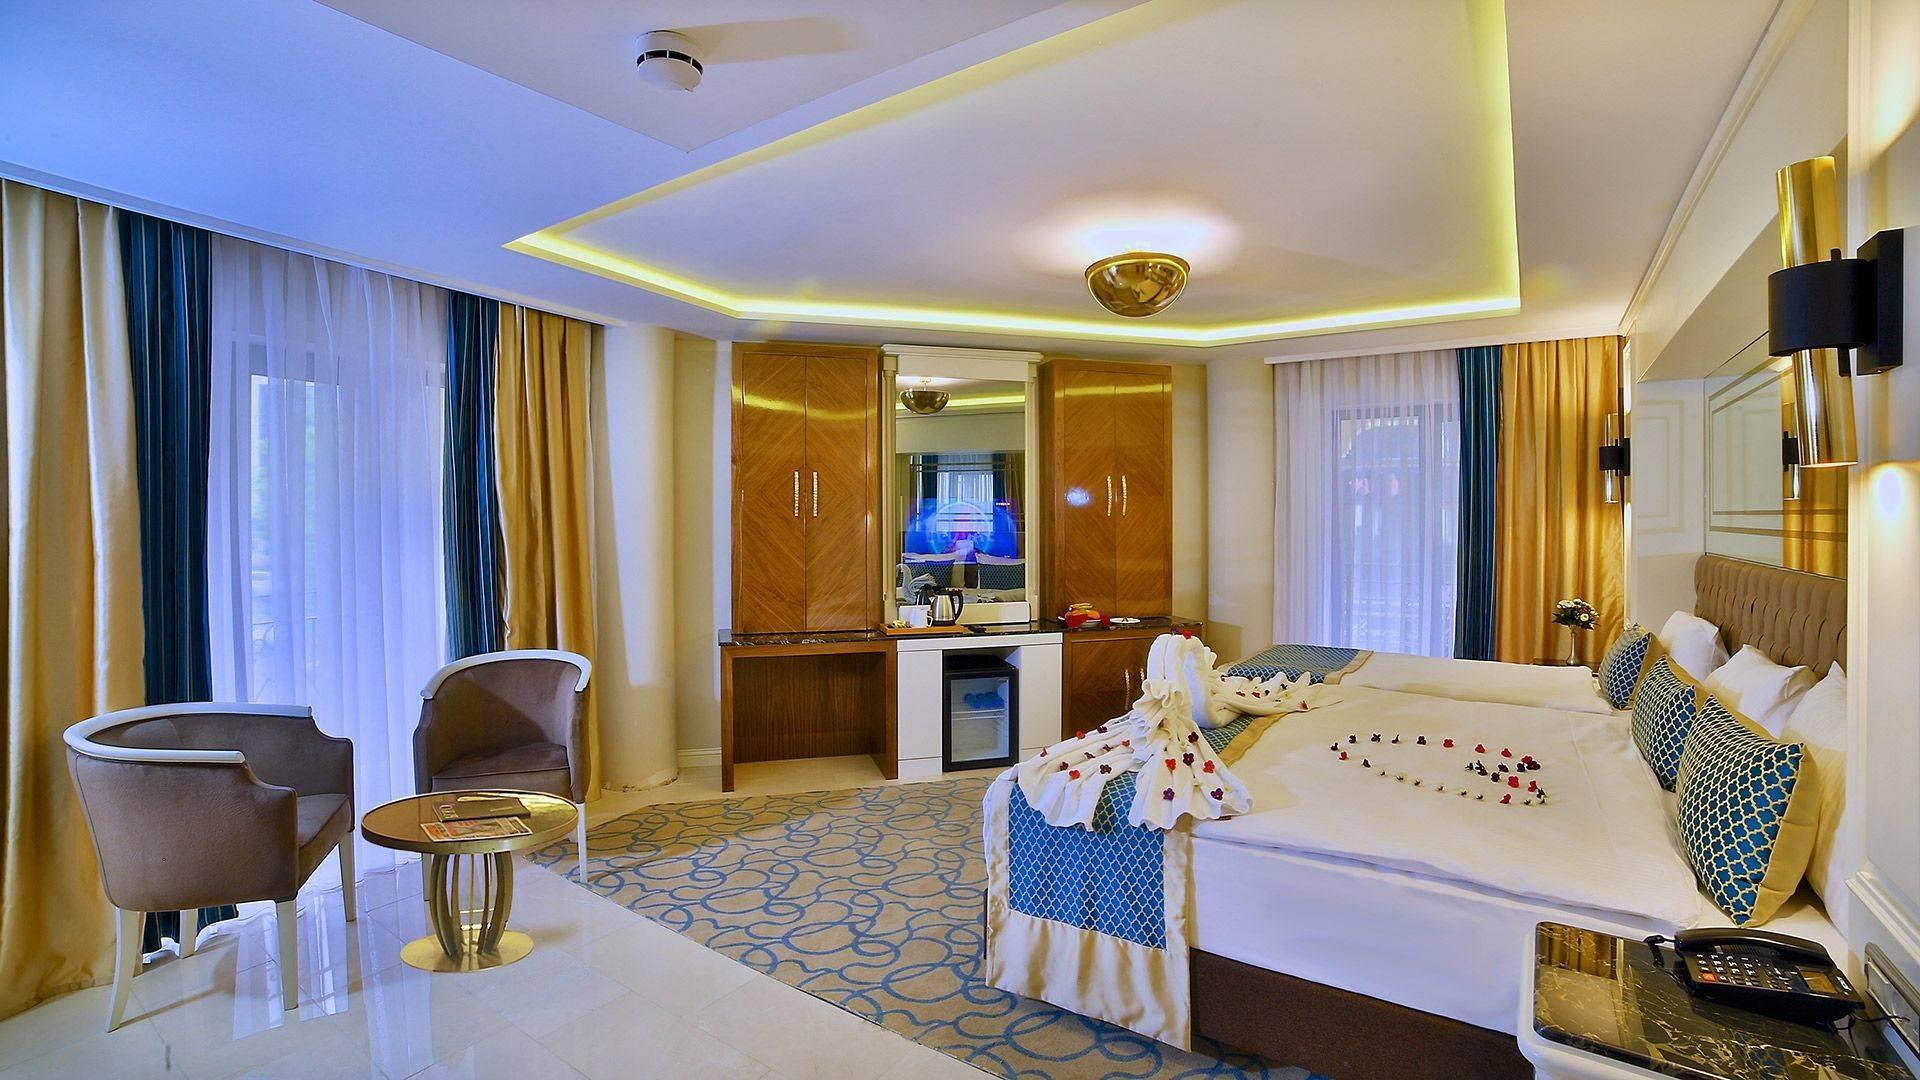 Beethoven Premium Otel, İstanbul, Laleli, 29668